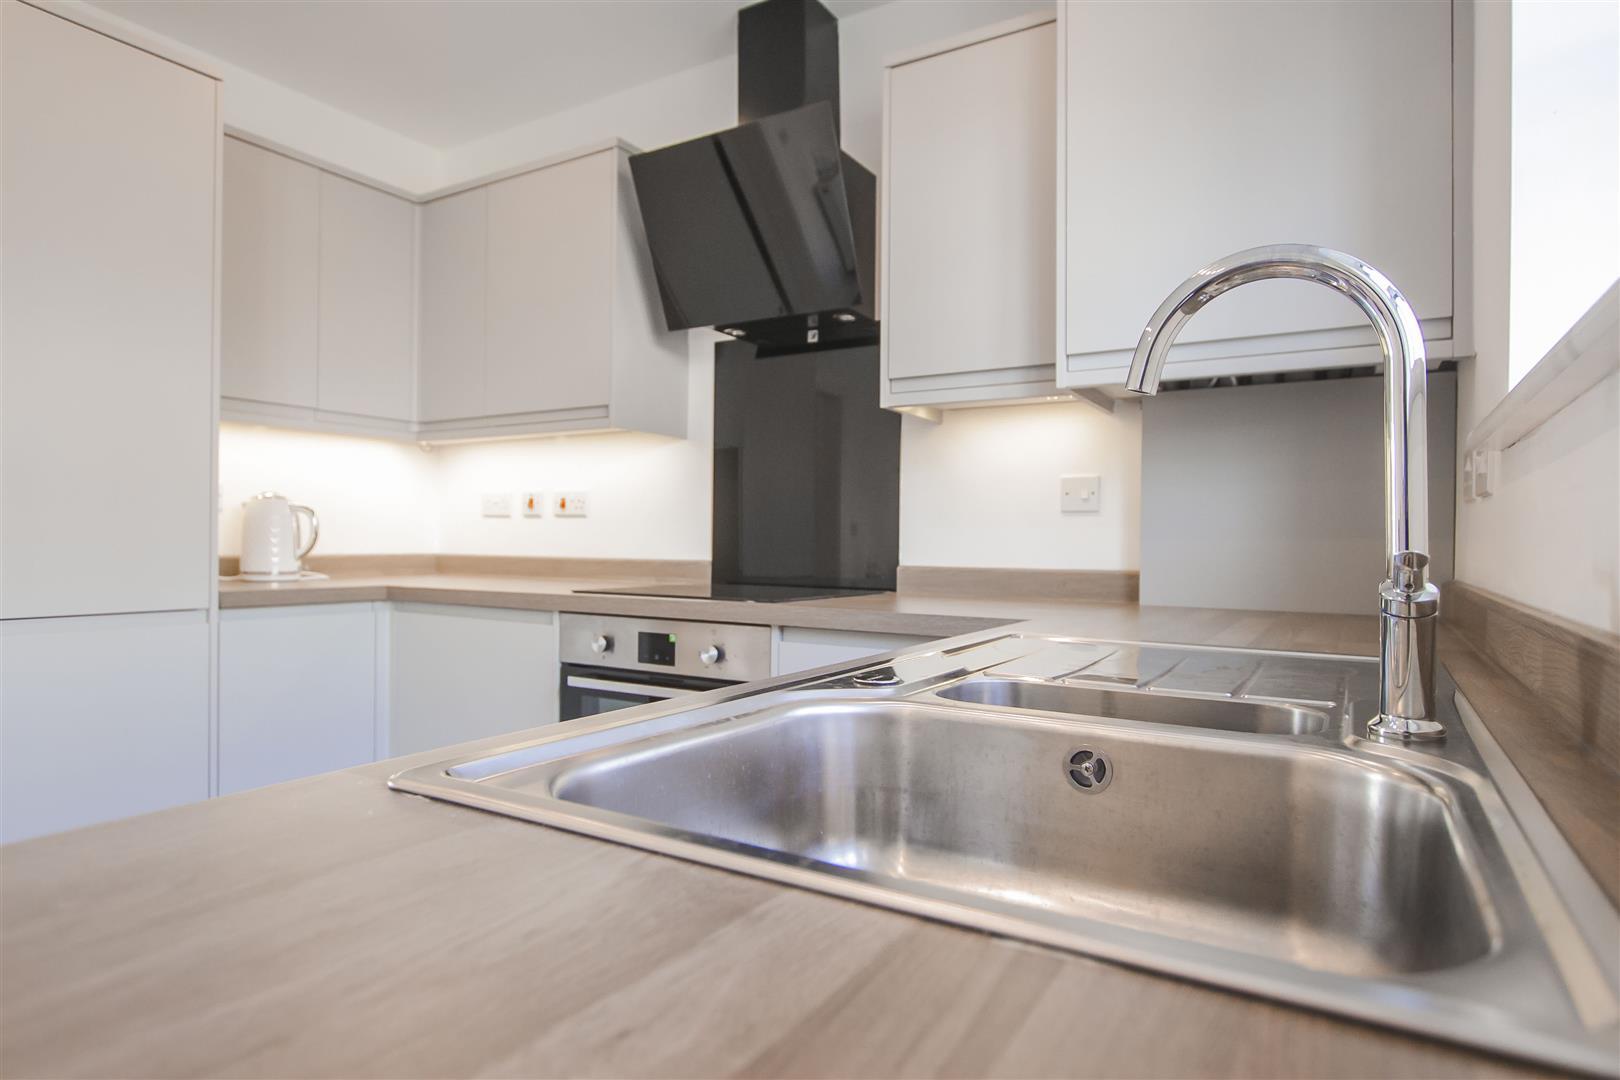 4 Bedroom Detached House For Sale - Show Home Kitchen (9).jpg